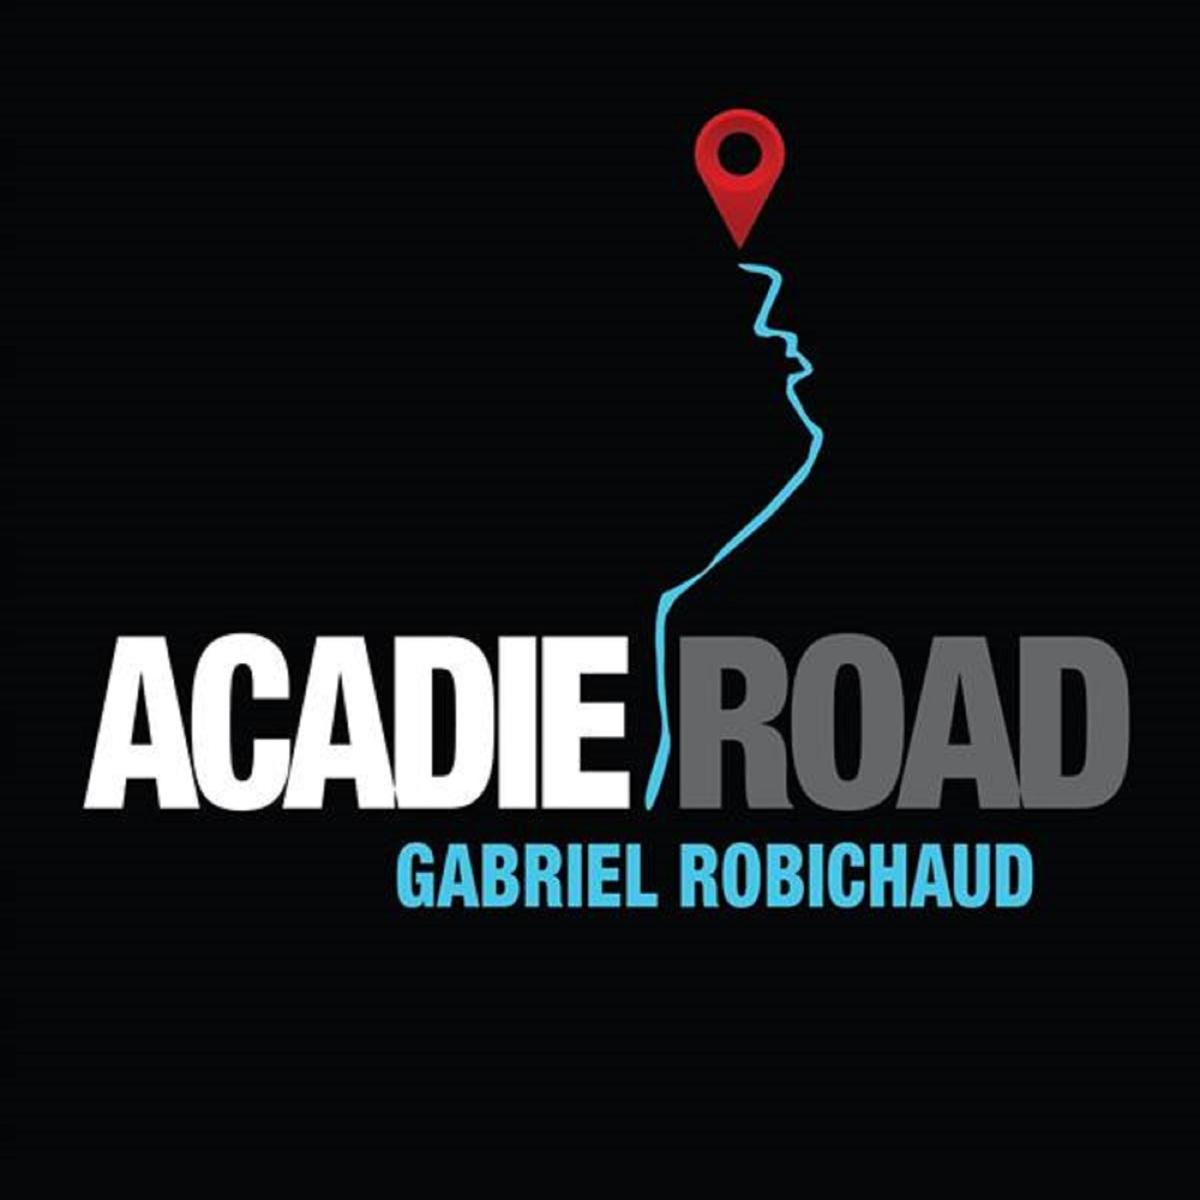 Acadie Road : droit dans un cul-de-sac - Mathieu Wade